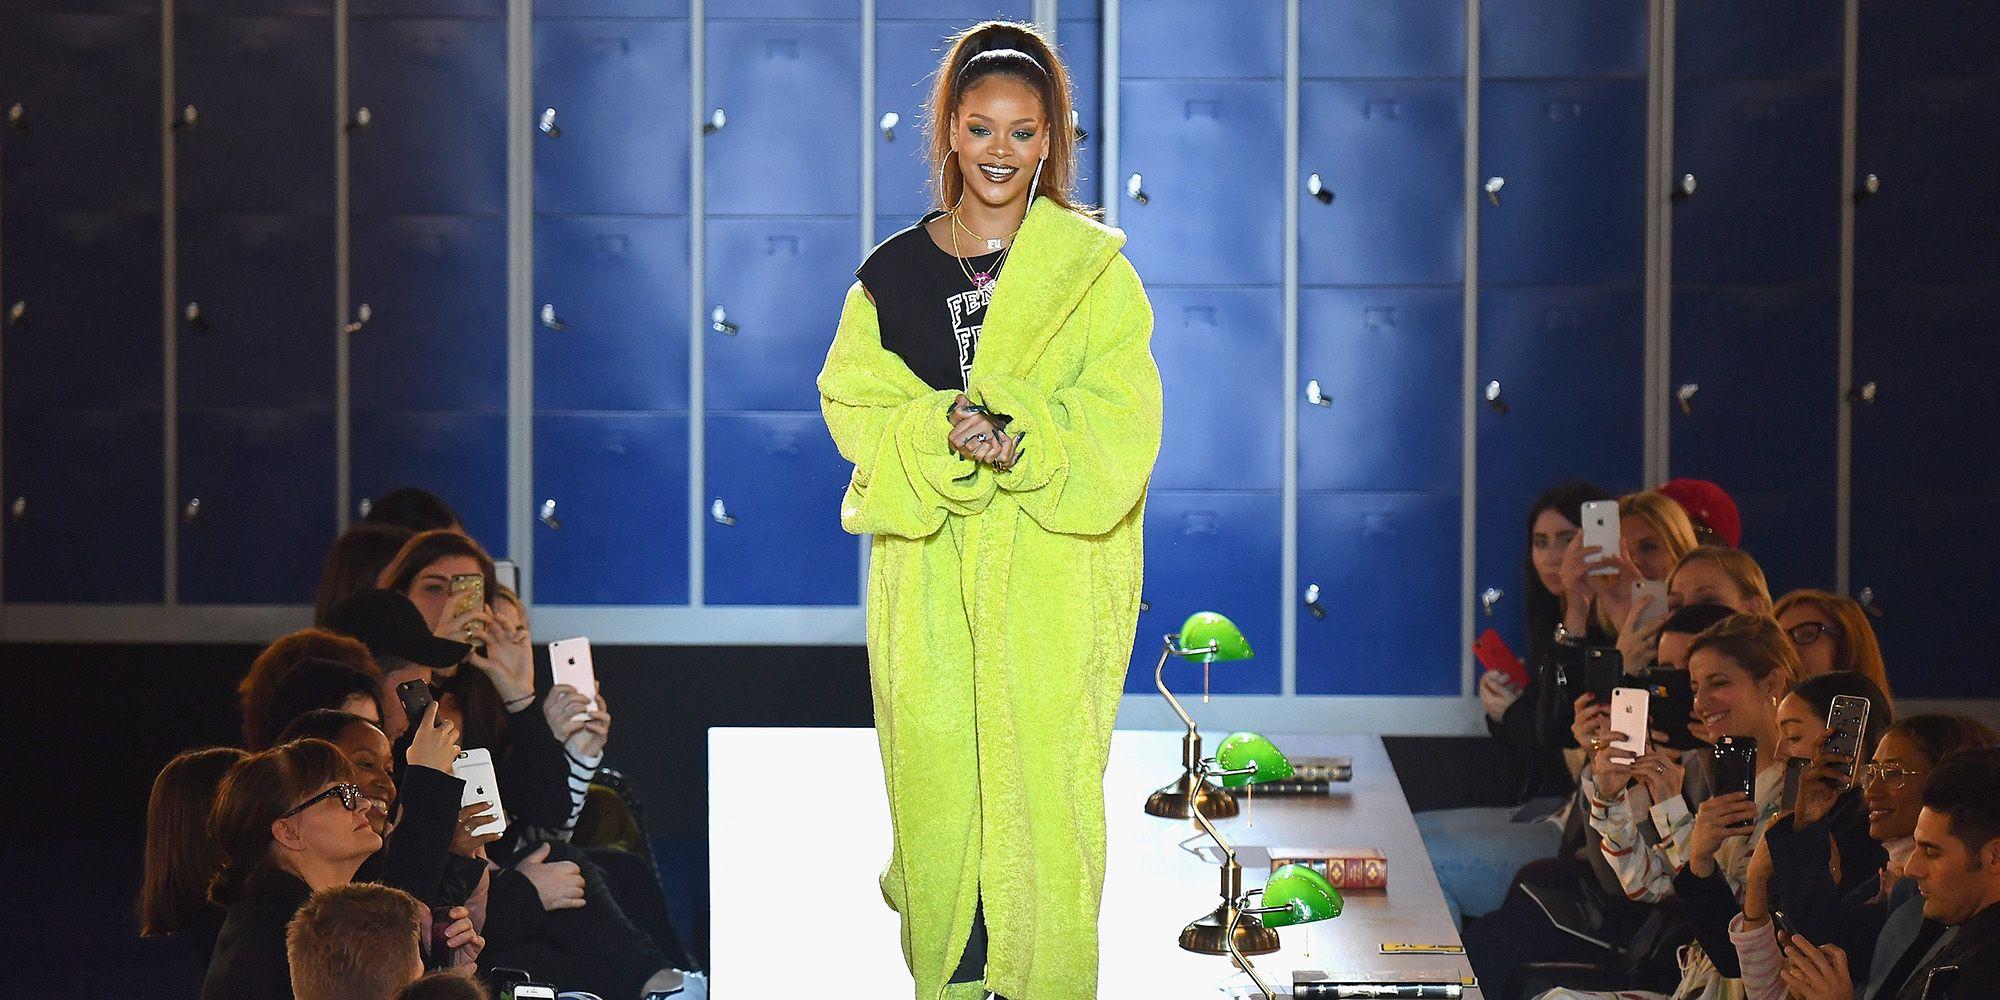 Green Fashion Week: Sustainable Fashion 19